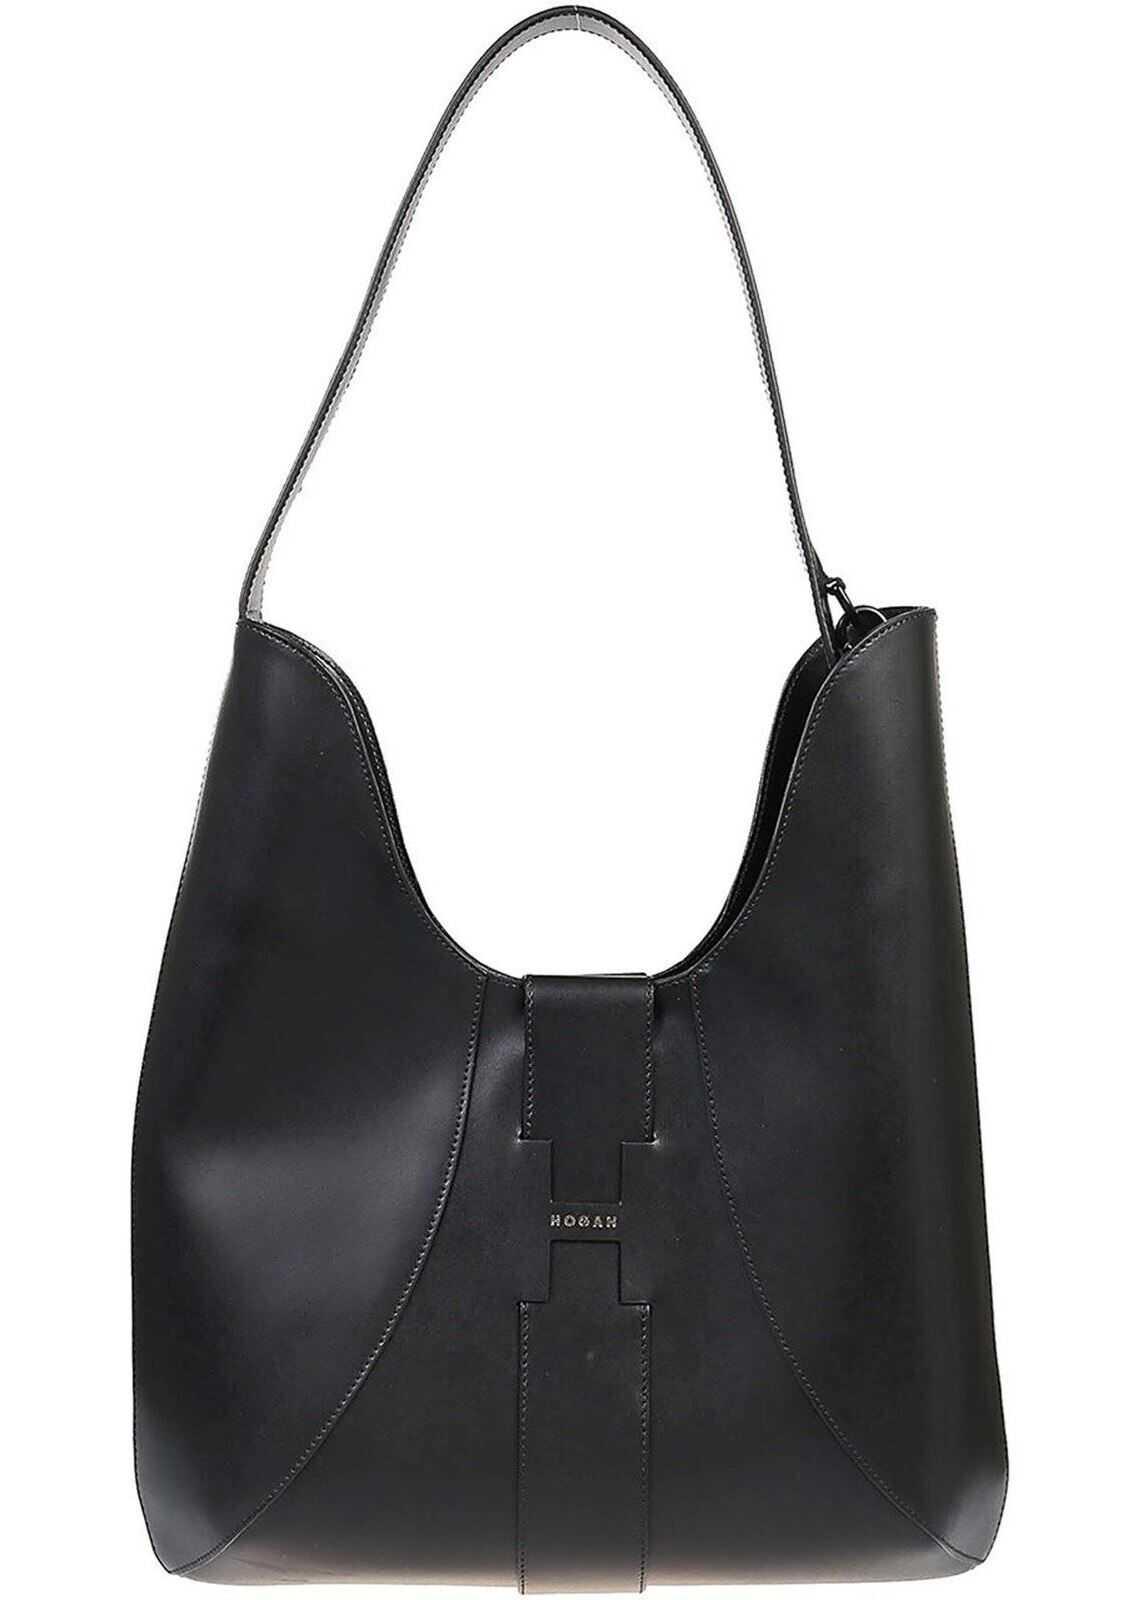 Hogan Black Leather Hobo Bag KBW01BS0300J60B999 Black imagine b-mall.ro